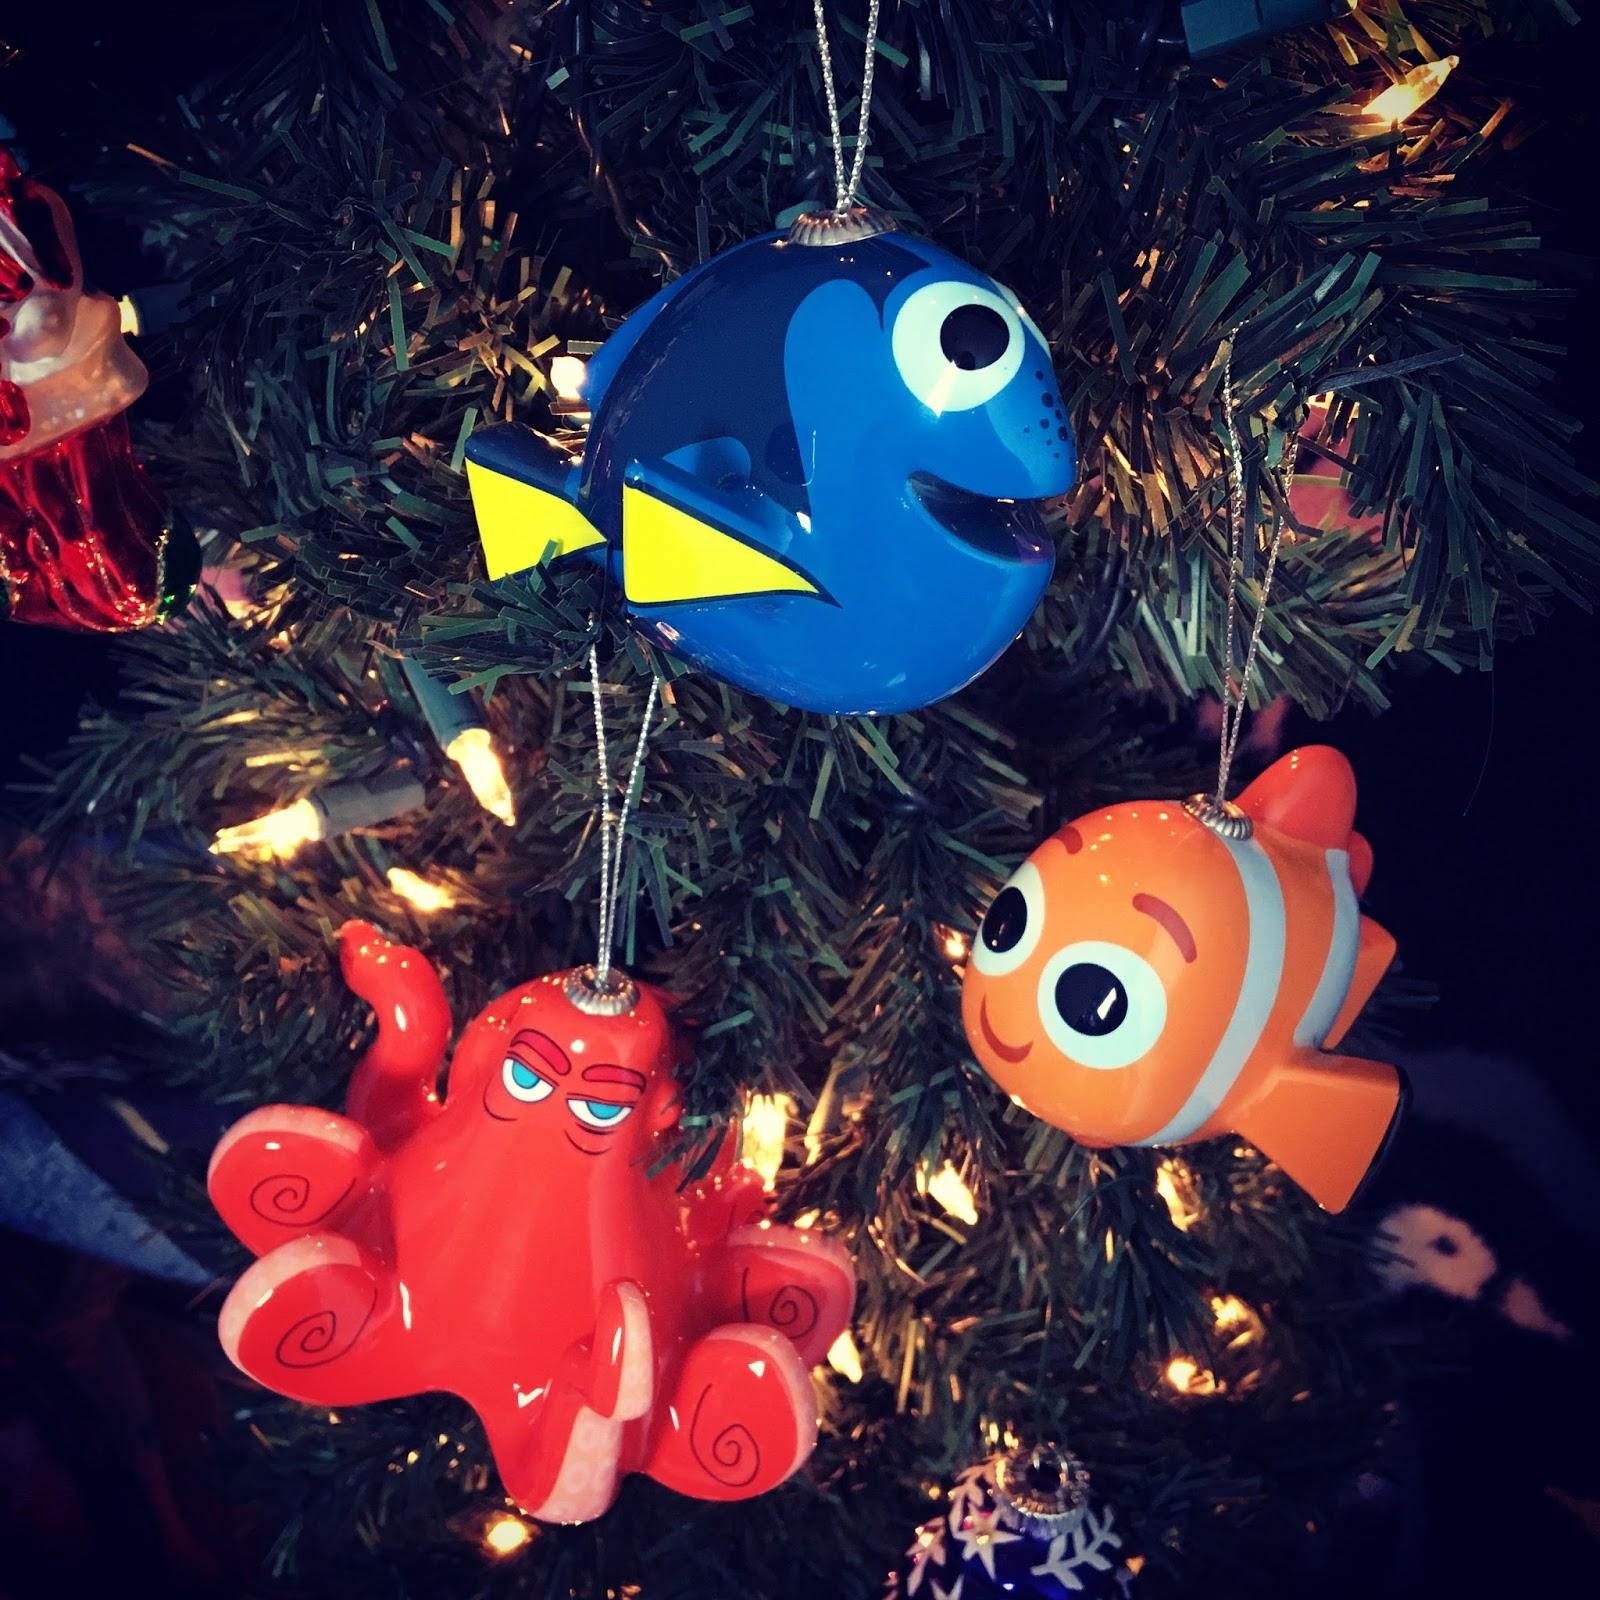 finding dory hallmark decoupage ornaments - Finding Nemo Christmas Decorations